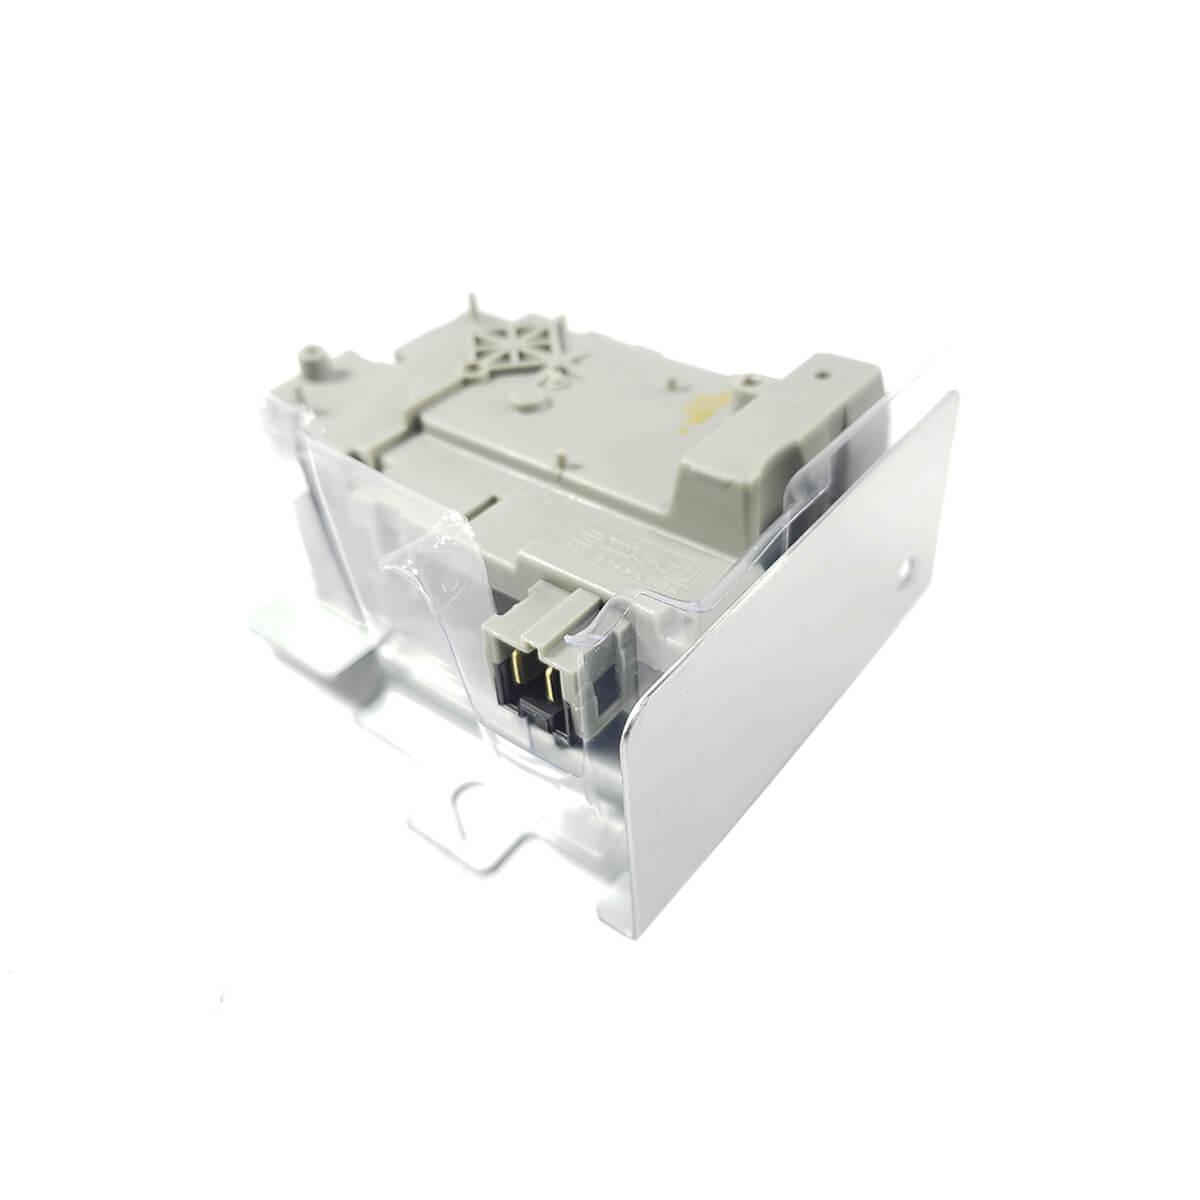 Atuador De Freio Lavadora de Roupas Electrolux TOP6 LM06 LF75 TOP8 Emicol  - 64484424 / 64484559